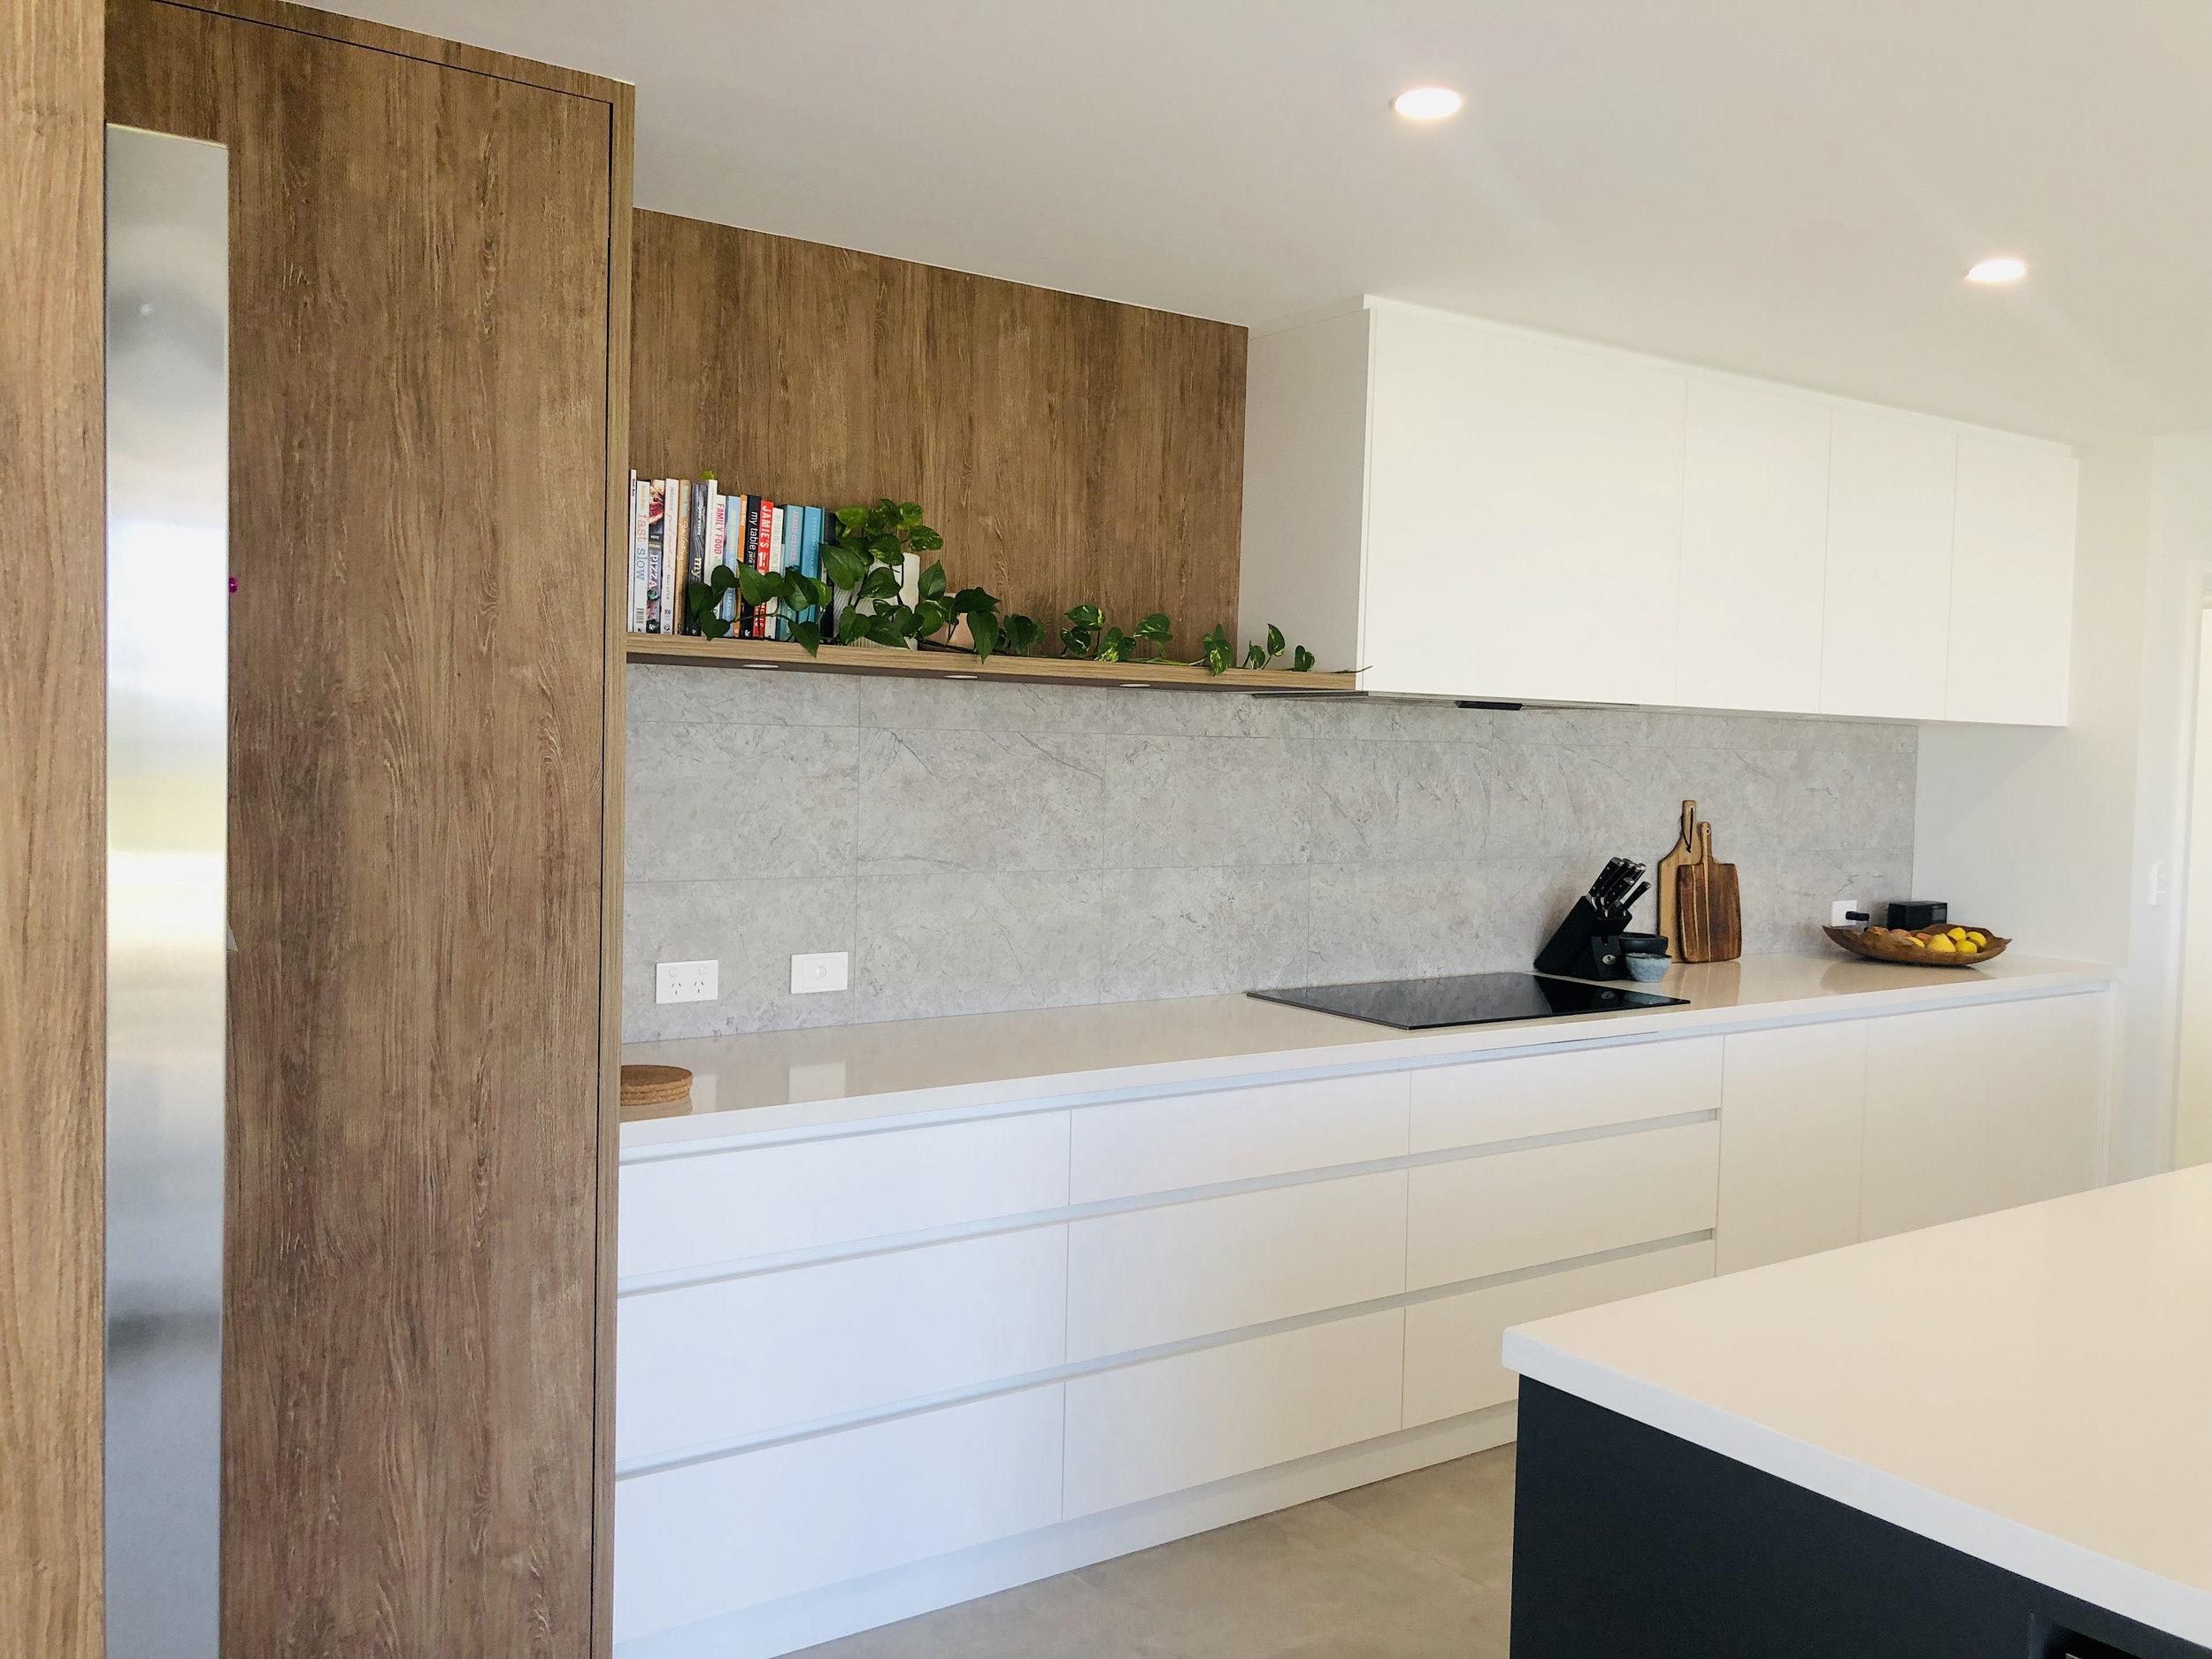 aruma_kitchen_01.jpg